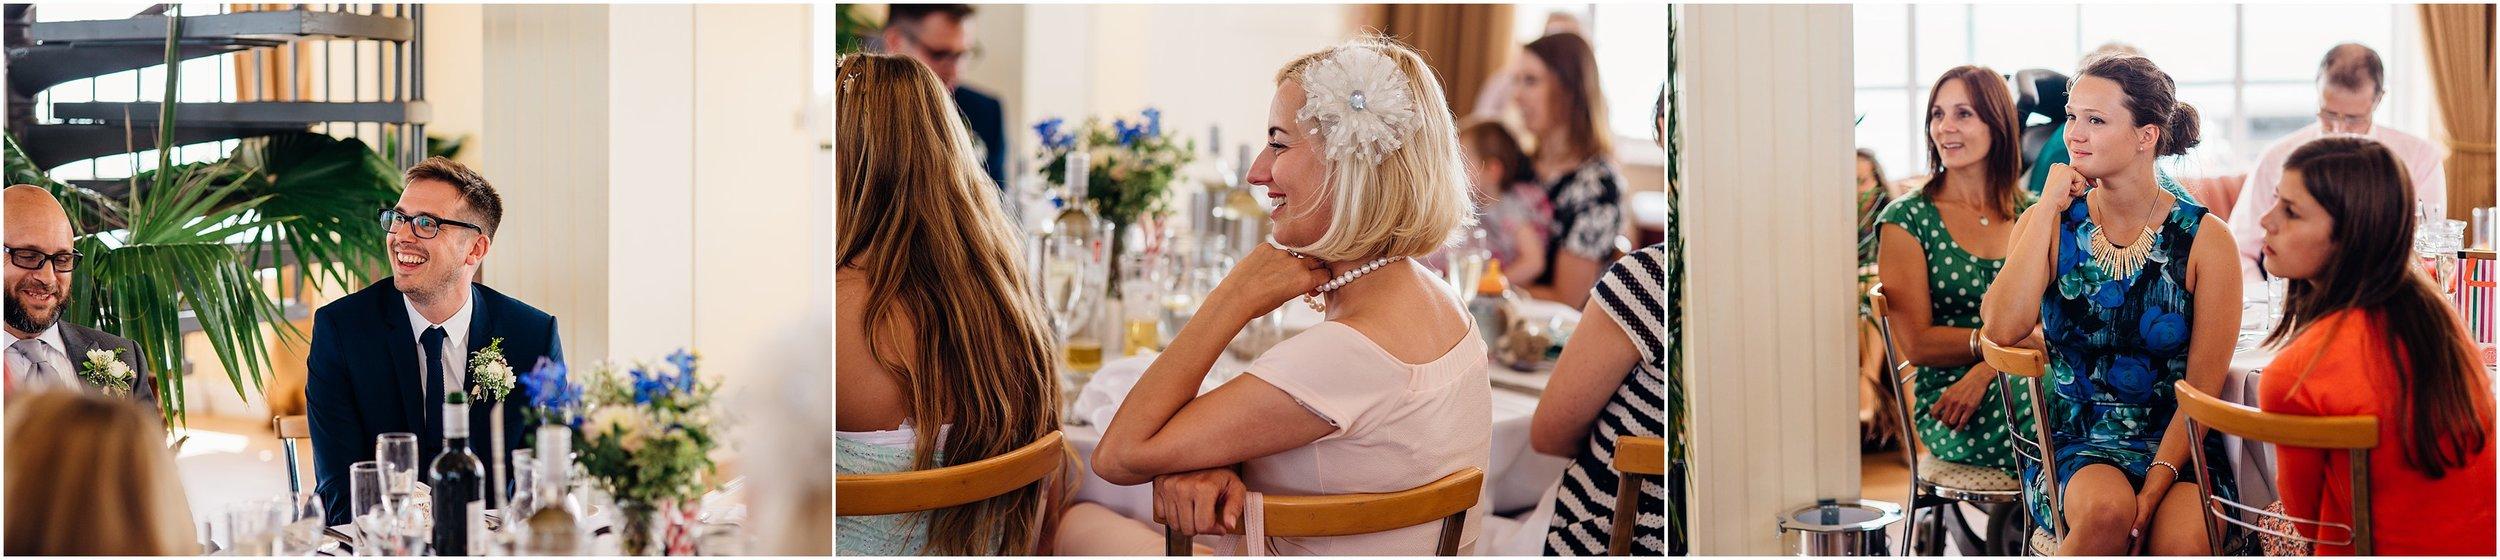 Art Deco Worthing Pier Wedding_0052.jpg